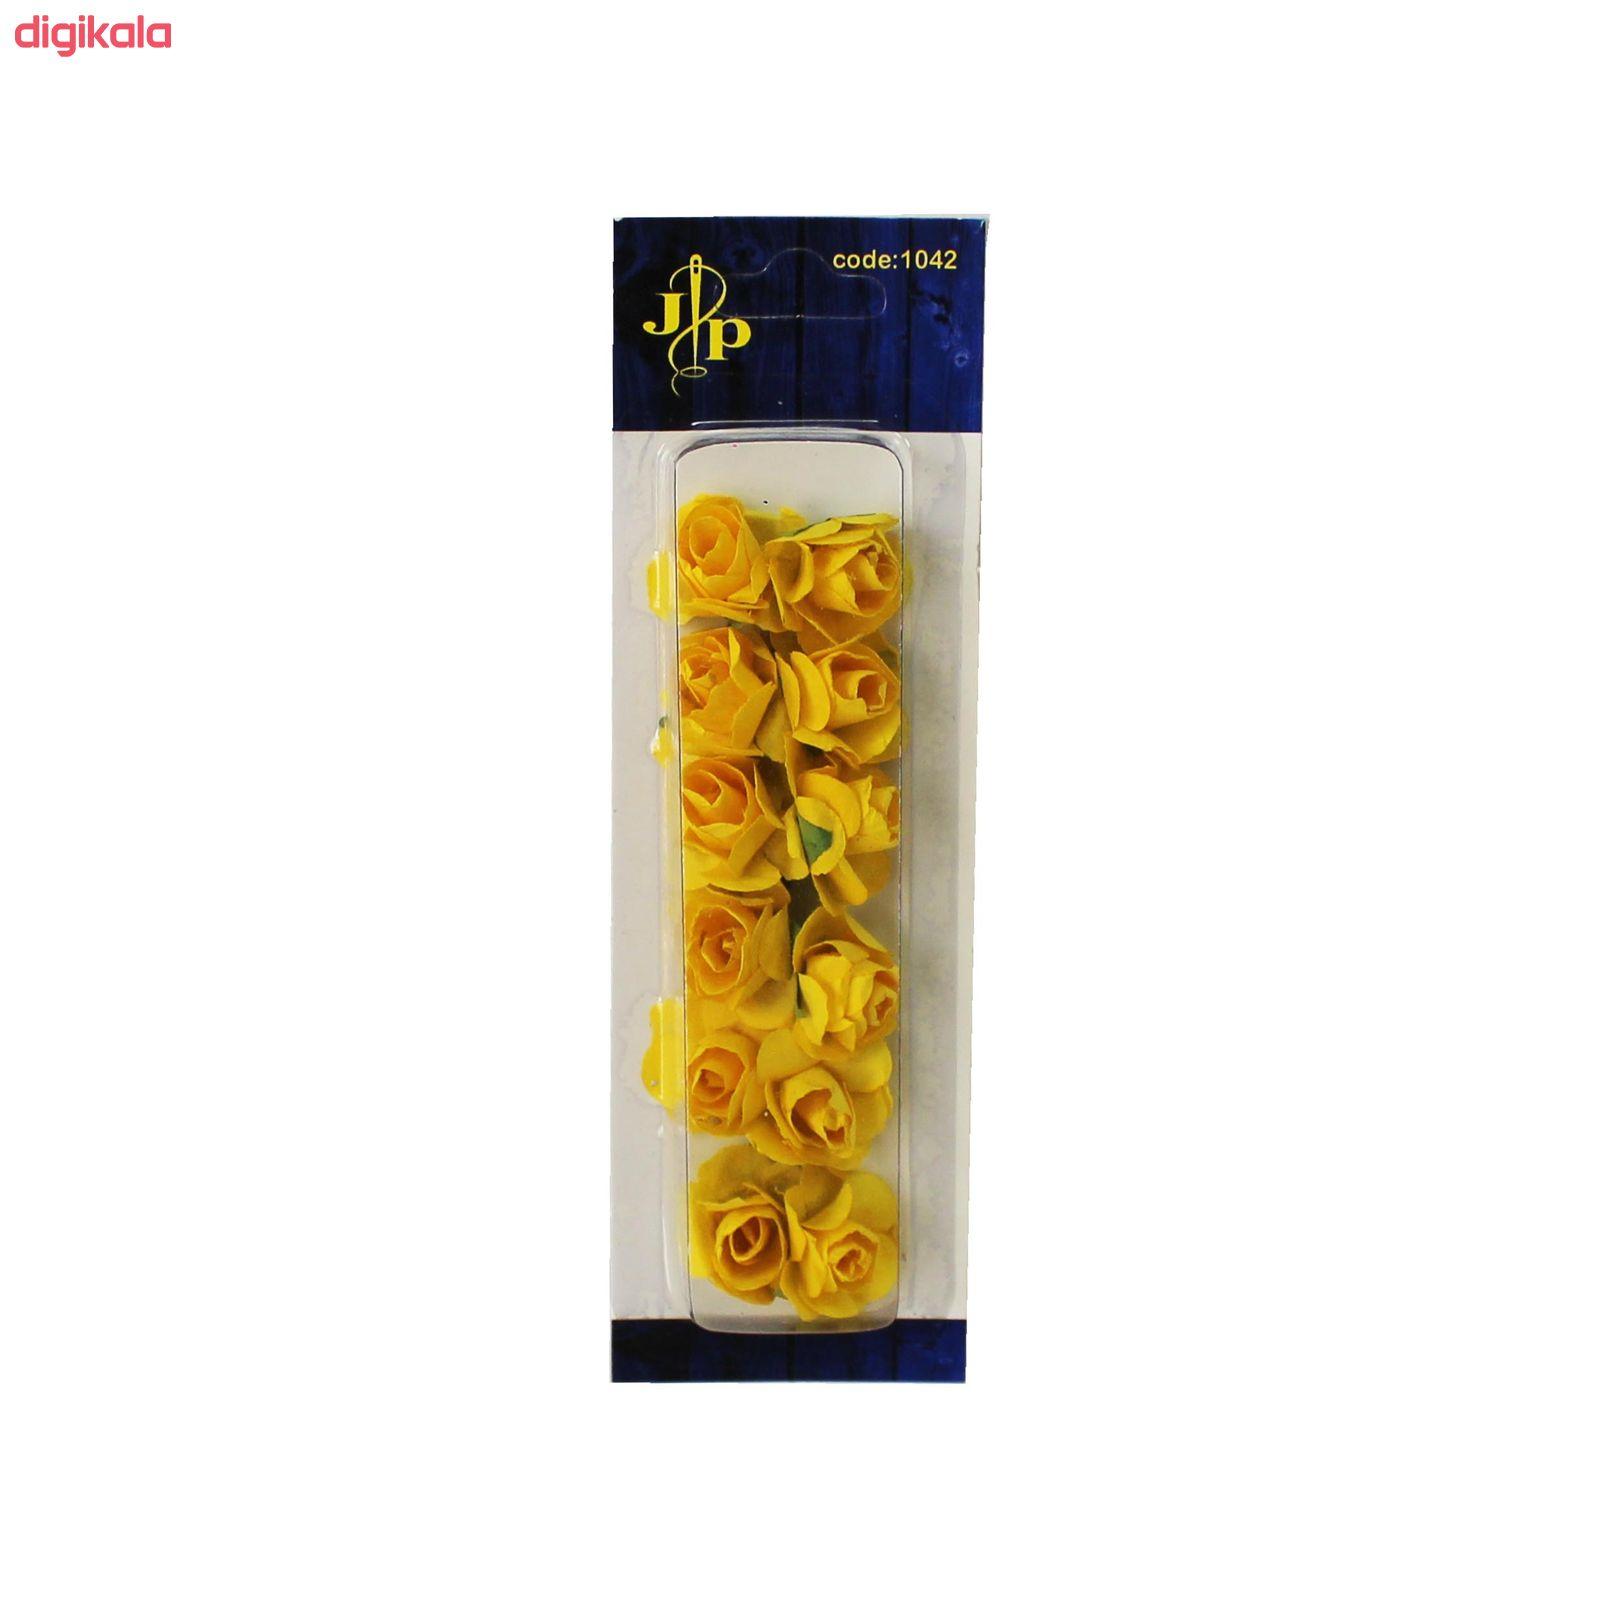 گل مصنوعی مدل رز کد 33-01 بسته 12 عددی main 1 11